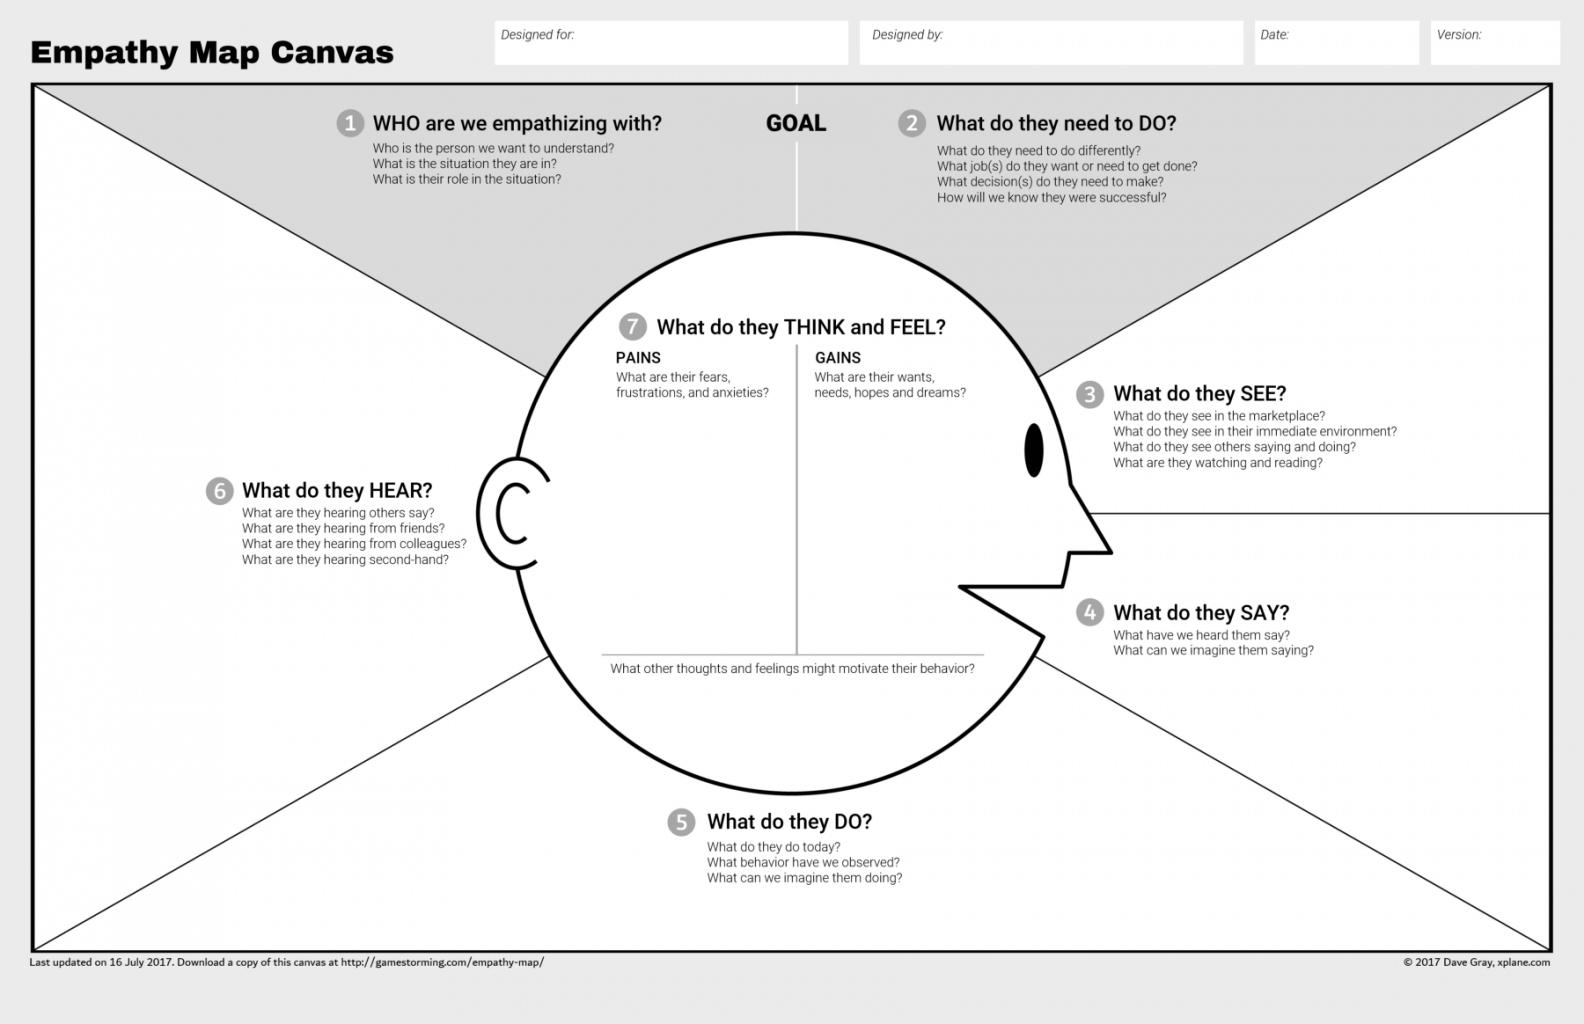 Empathy Map Canvas